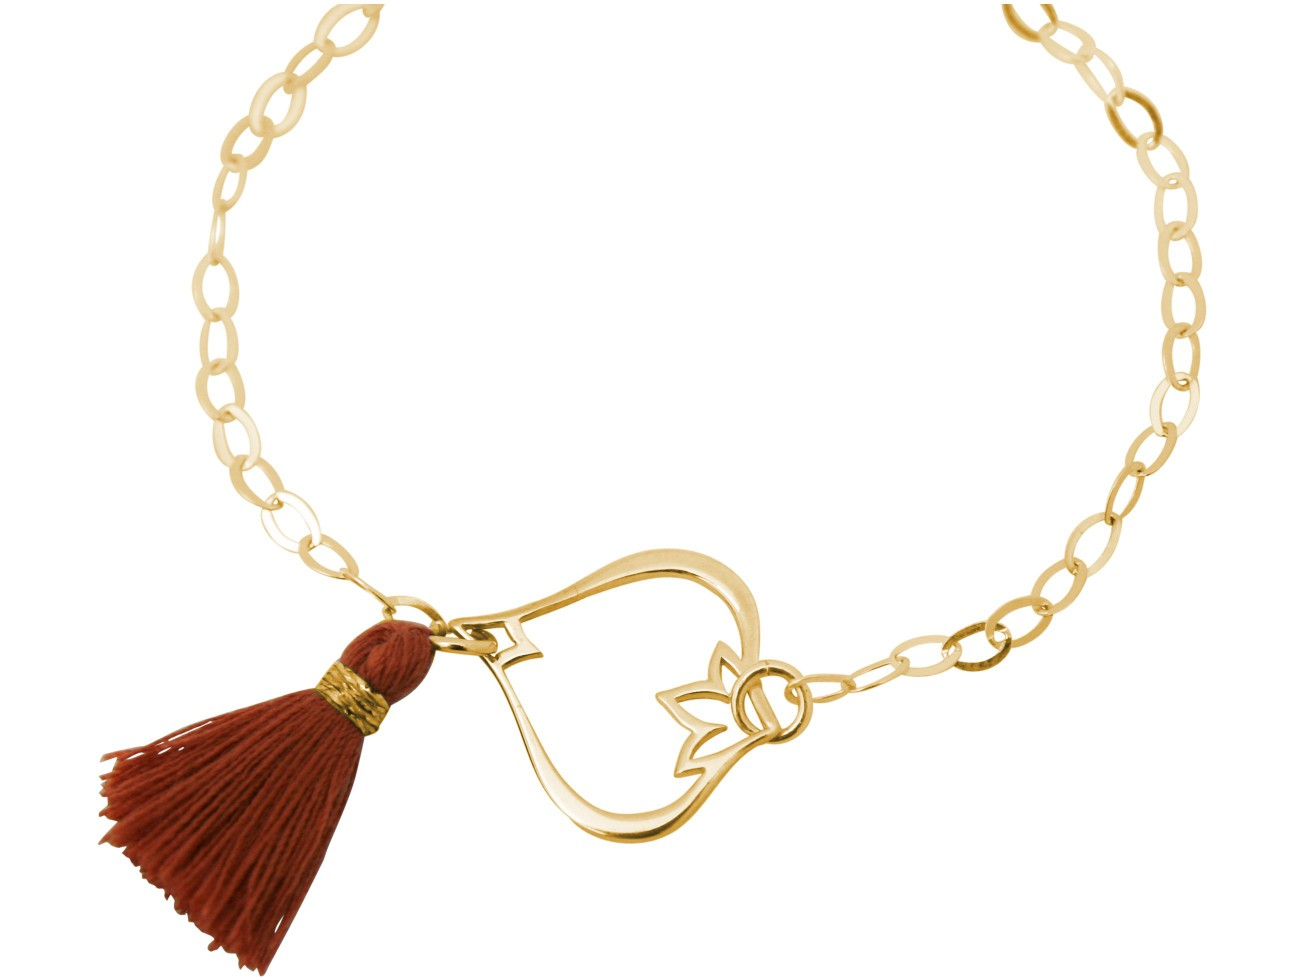 Armband 925 Silber Vergoldet Lotus Blume Quaste...